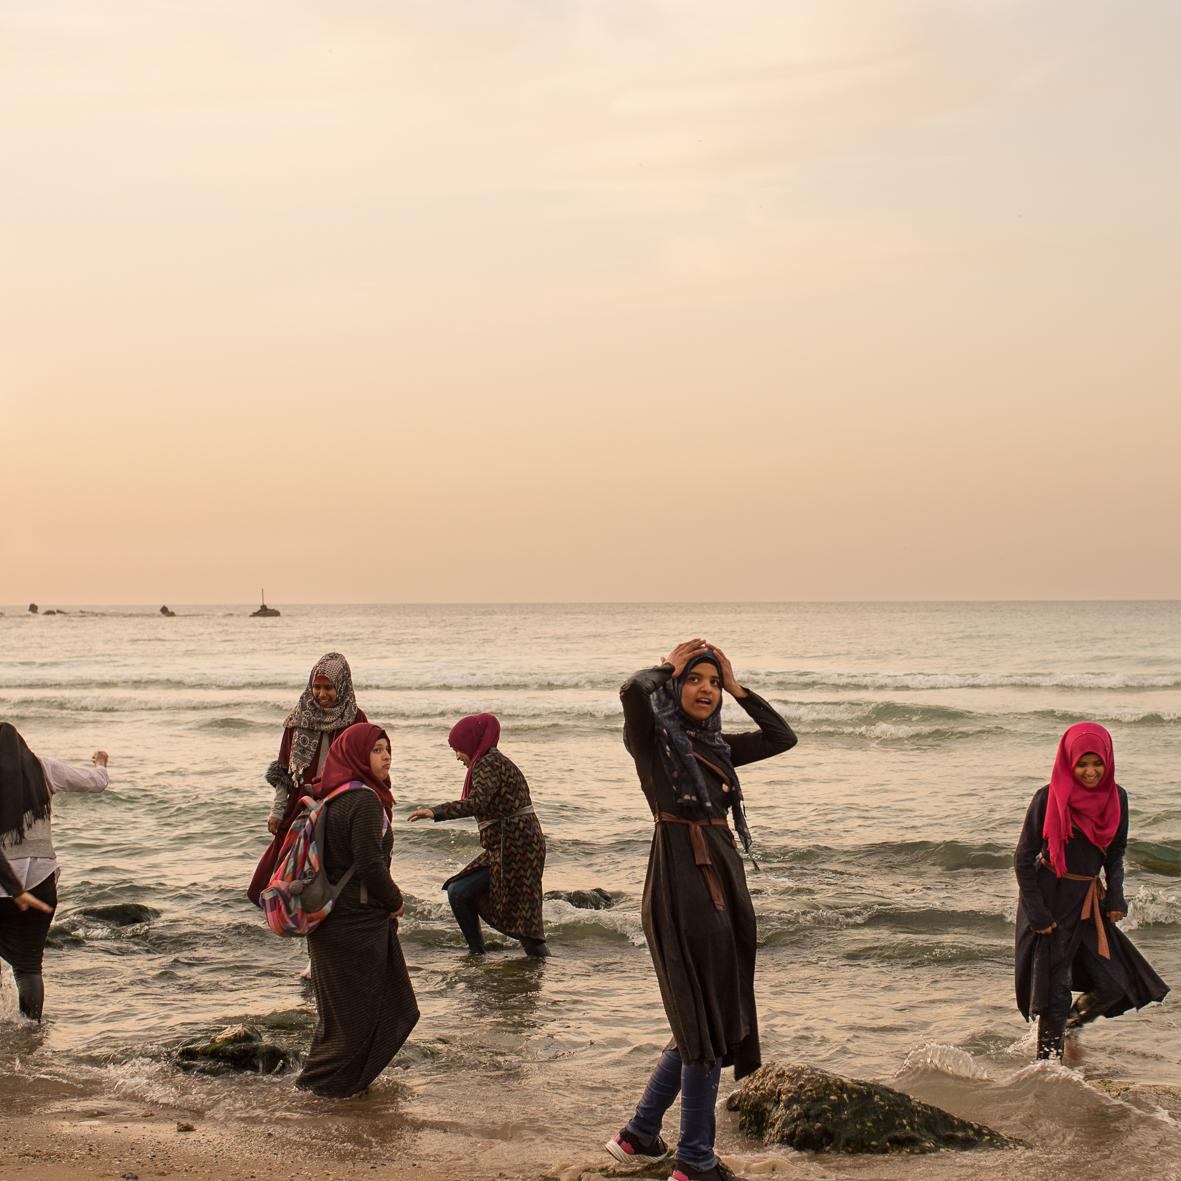 Badende Frauen bei Sonnenuntergang 2, Jaffa